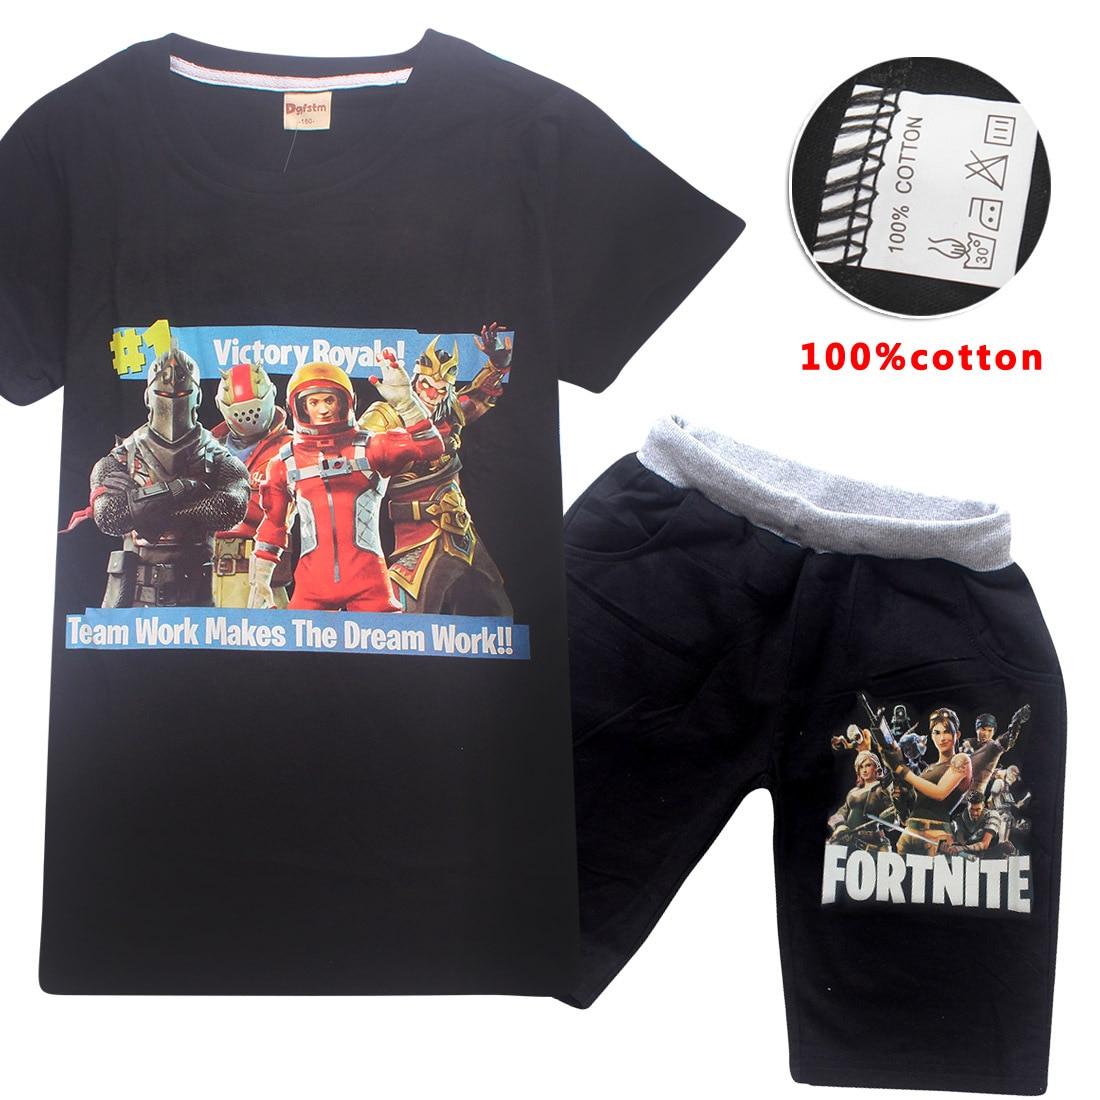 Police Shirt Roblox Code Nils Stucki Kieferorthopade Free Roblox T Shirt Template Free Robux No Verification 2019 No Download